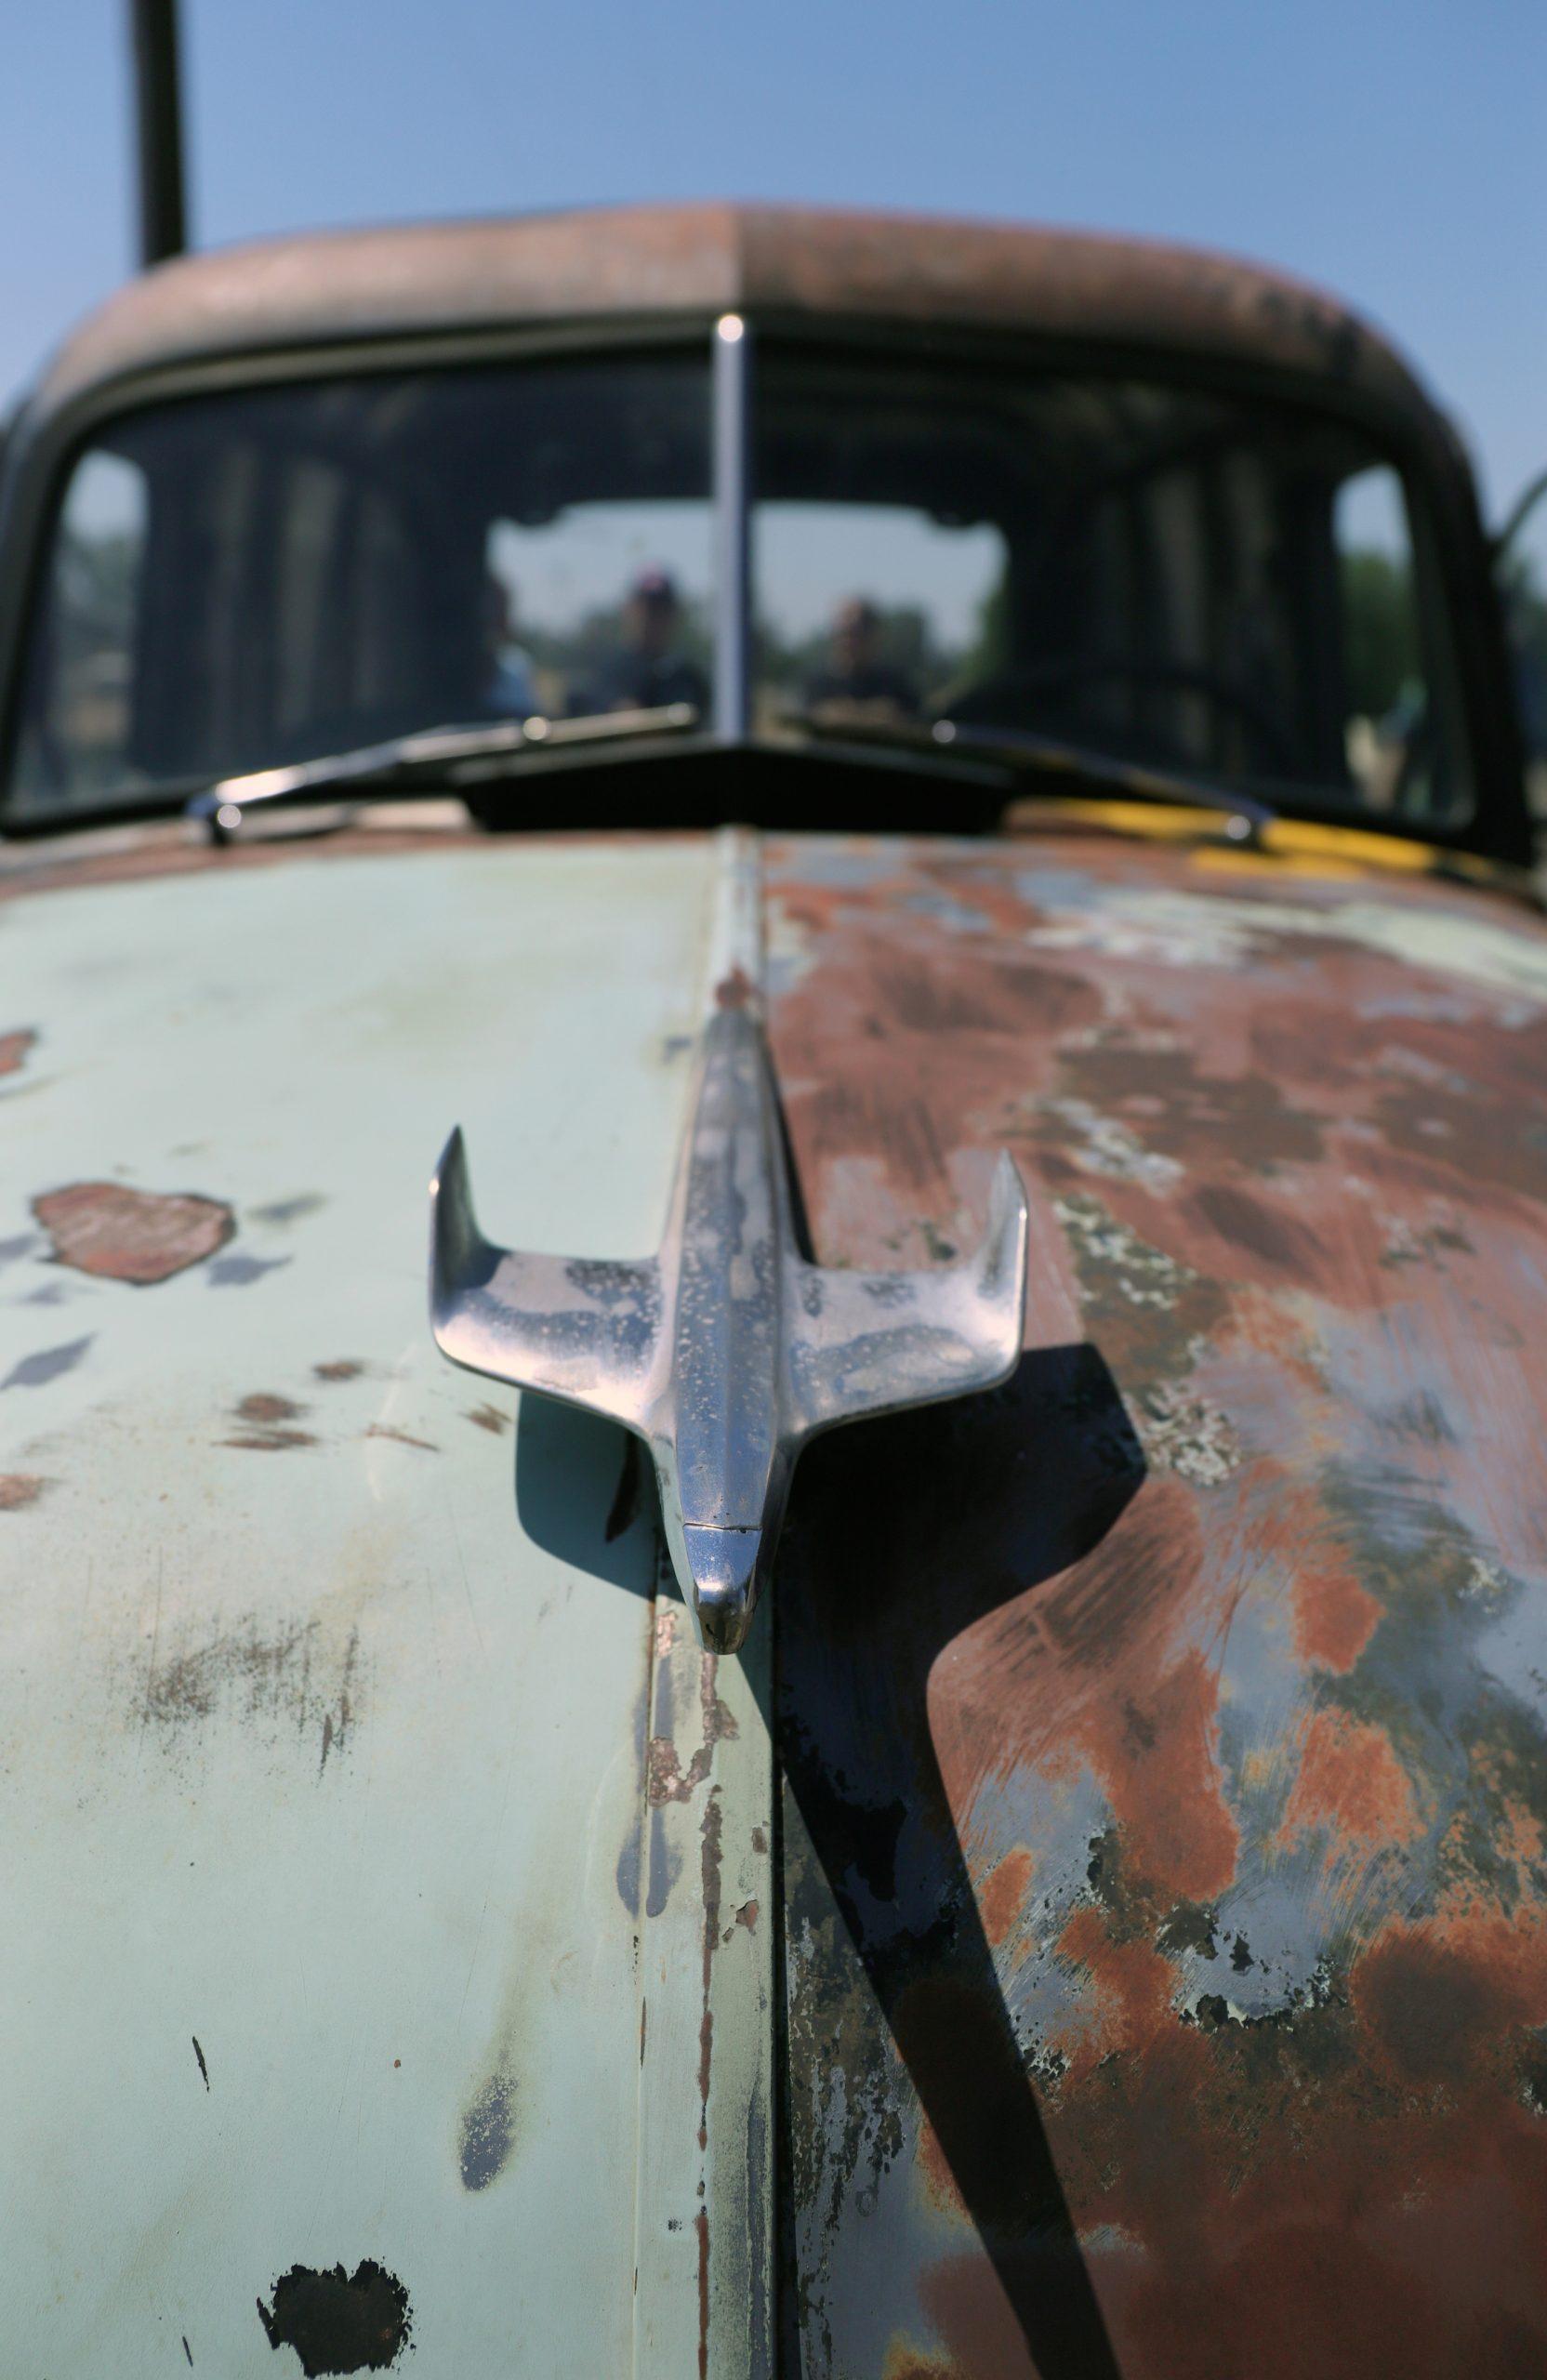 1953 GMC 100 Panel Truck Ugly hood ornament